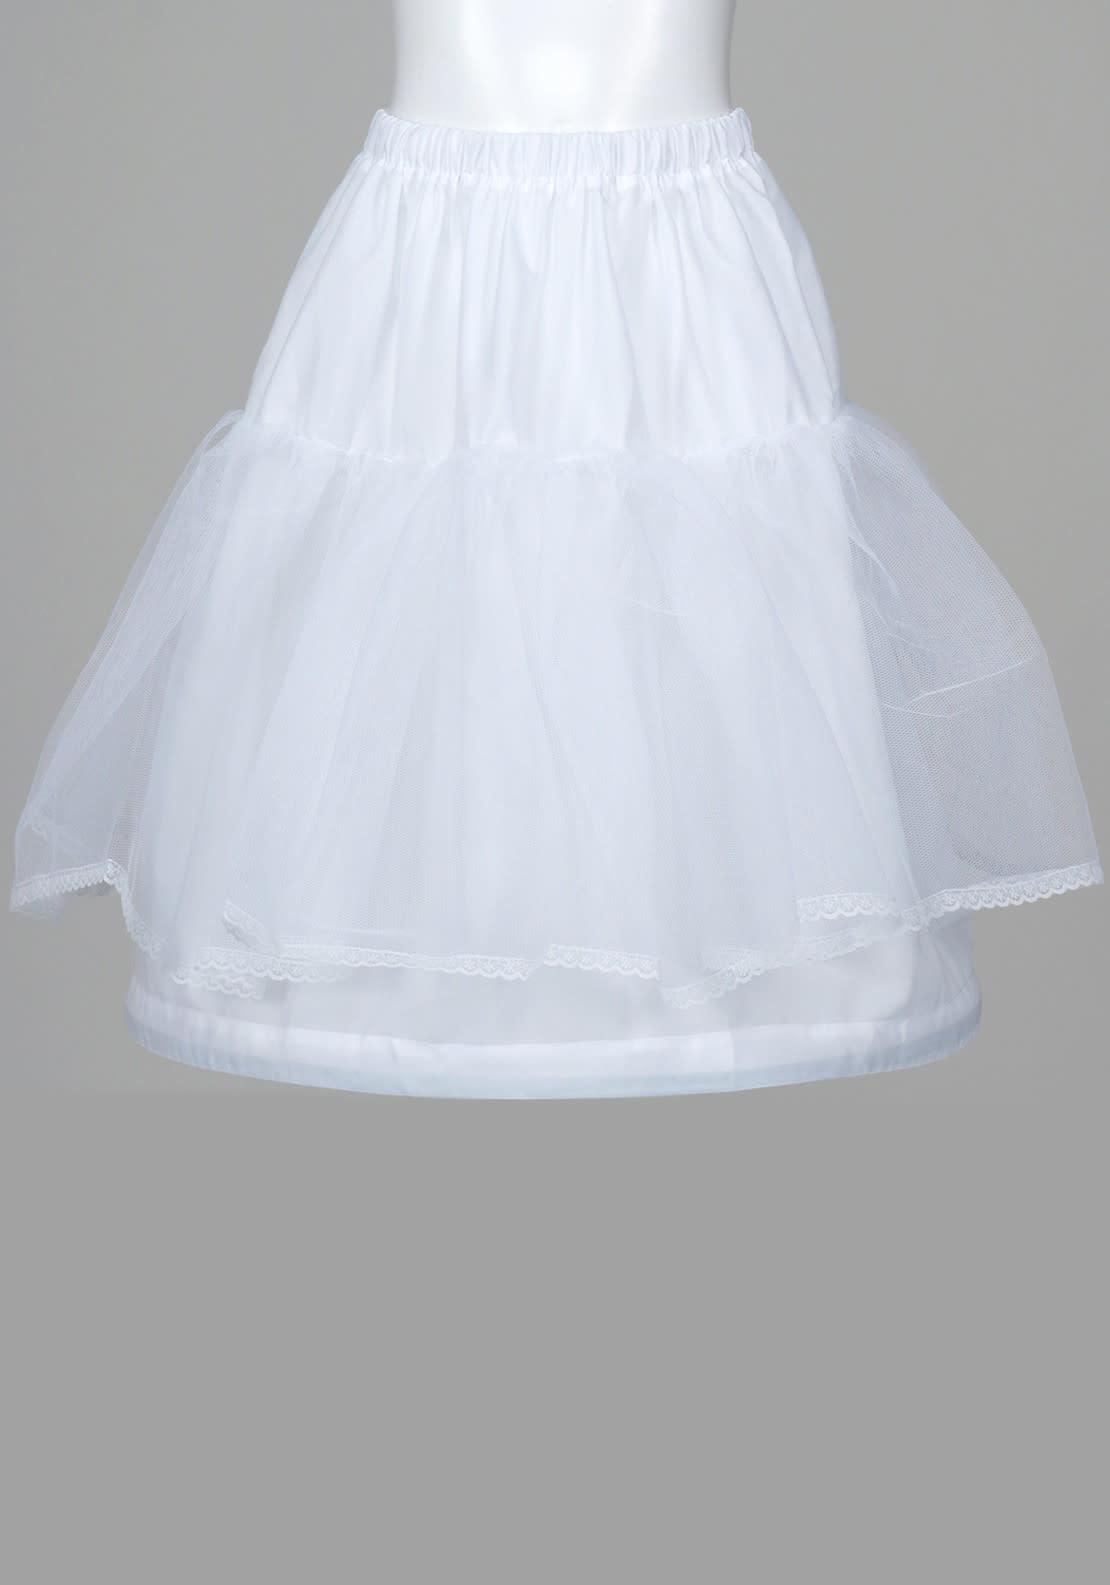 Little People Little People Communion Under Skirt